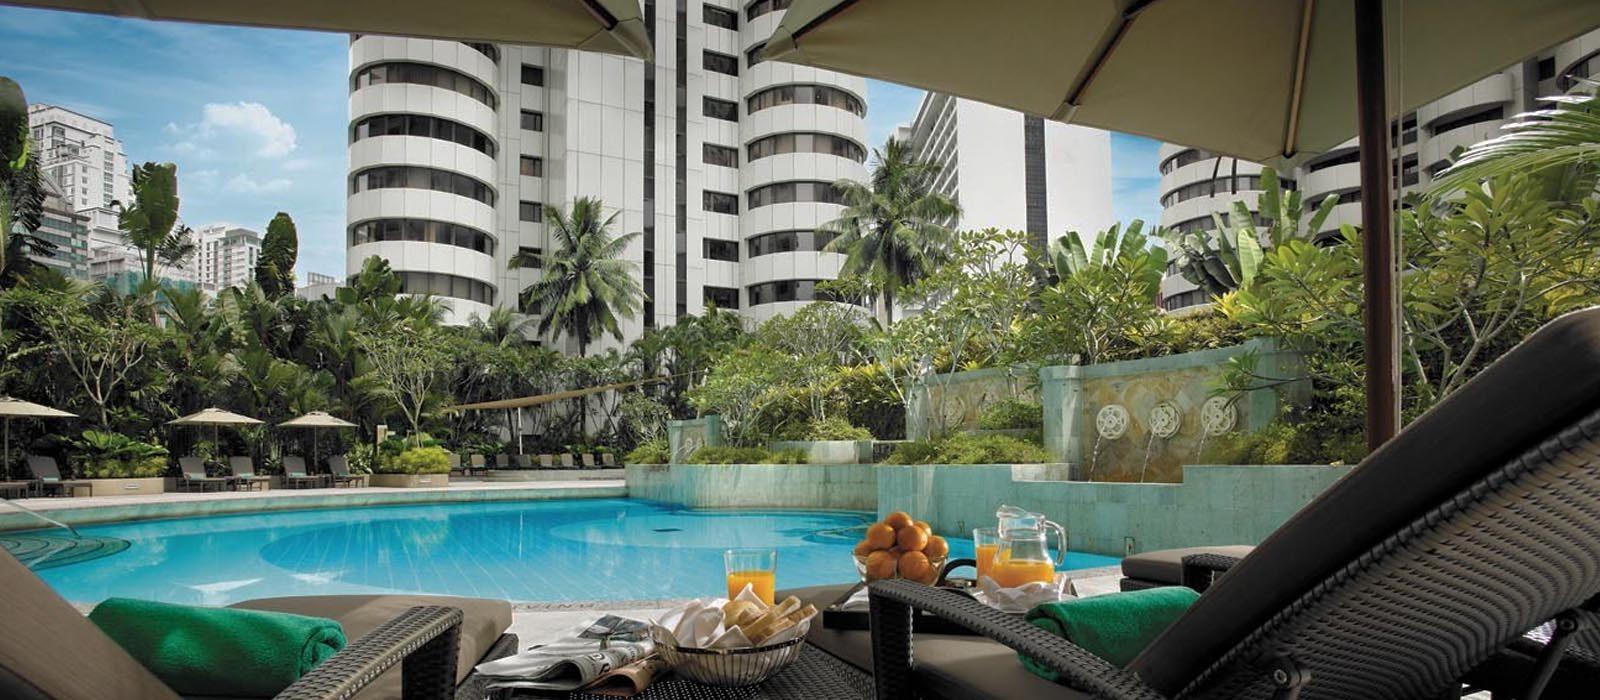 Malaysia Honeymoon Packages Shangri La Kuala Lumpur Header